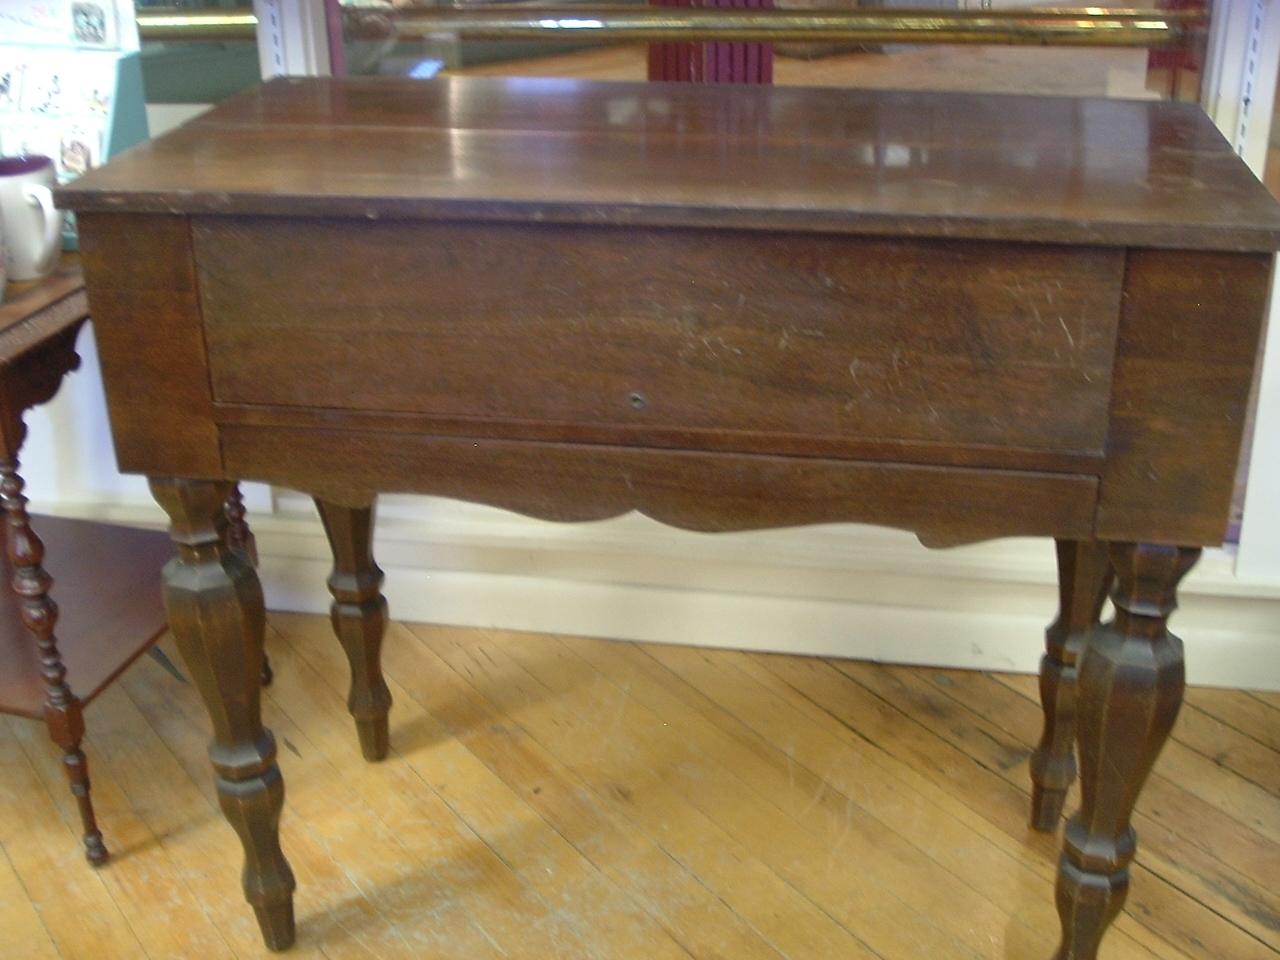 Antique Mahogany Spinet Desk And 50 Similar Items - Antique Writers Desk Antique Furniture